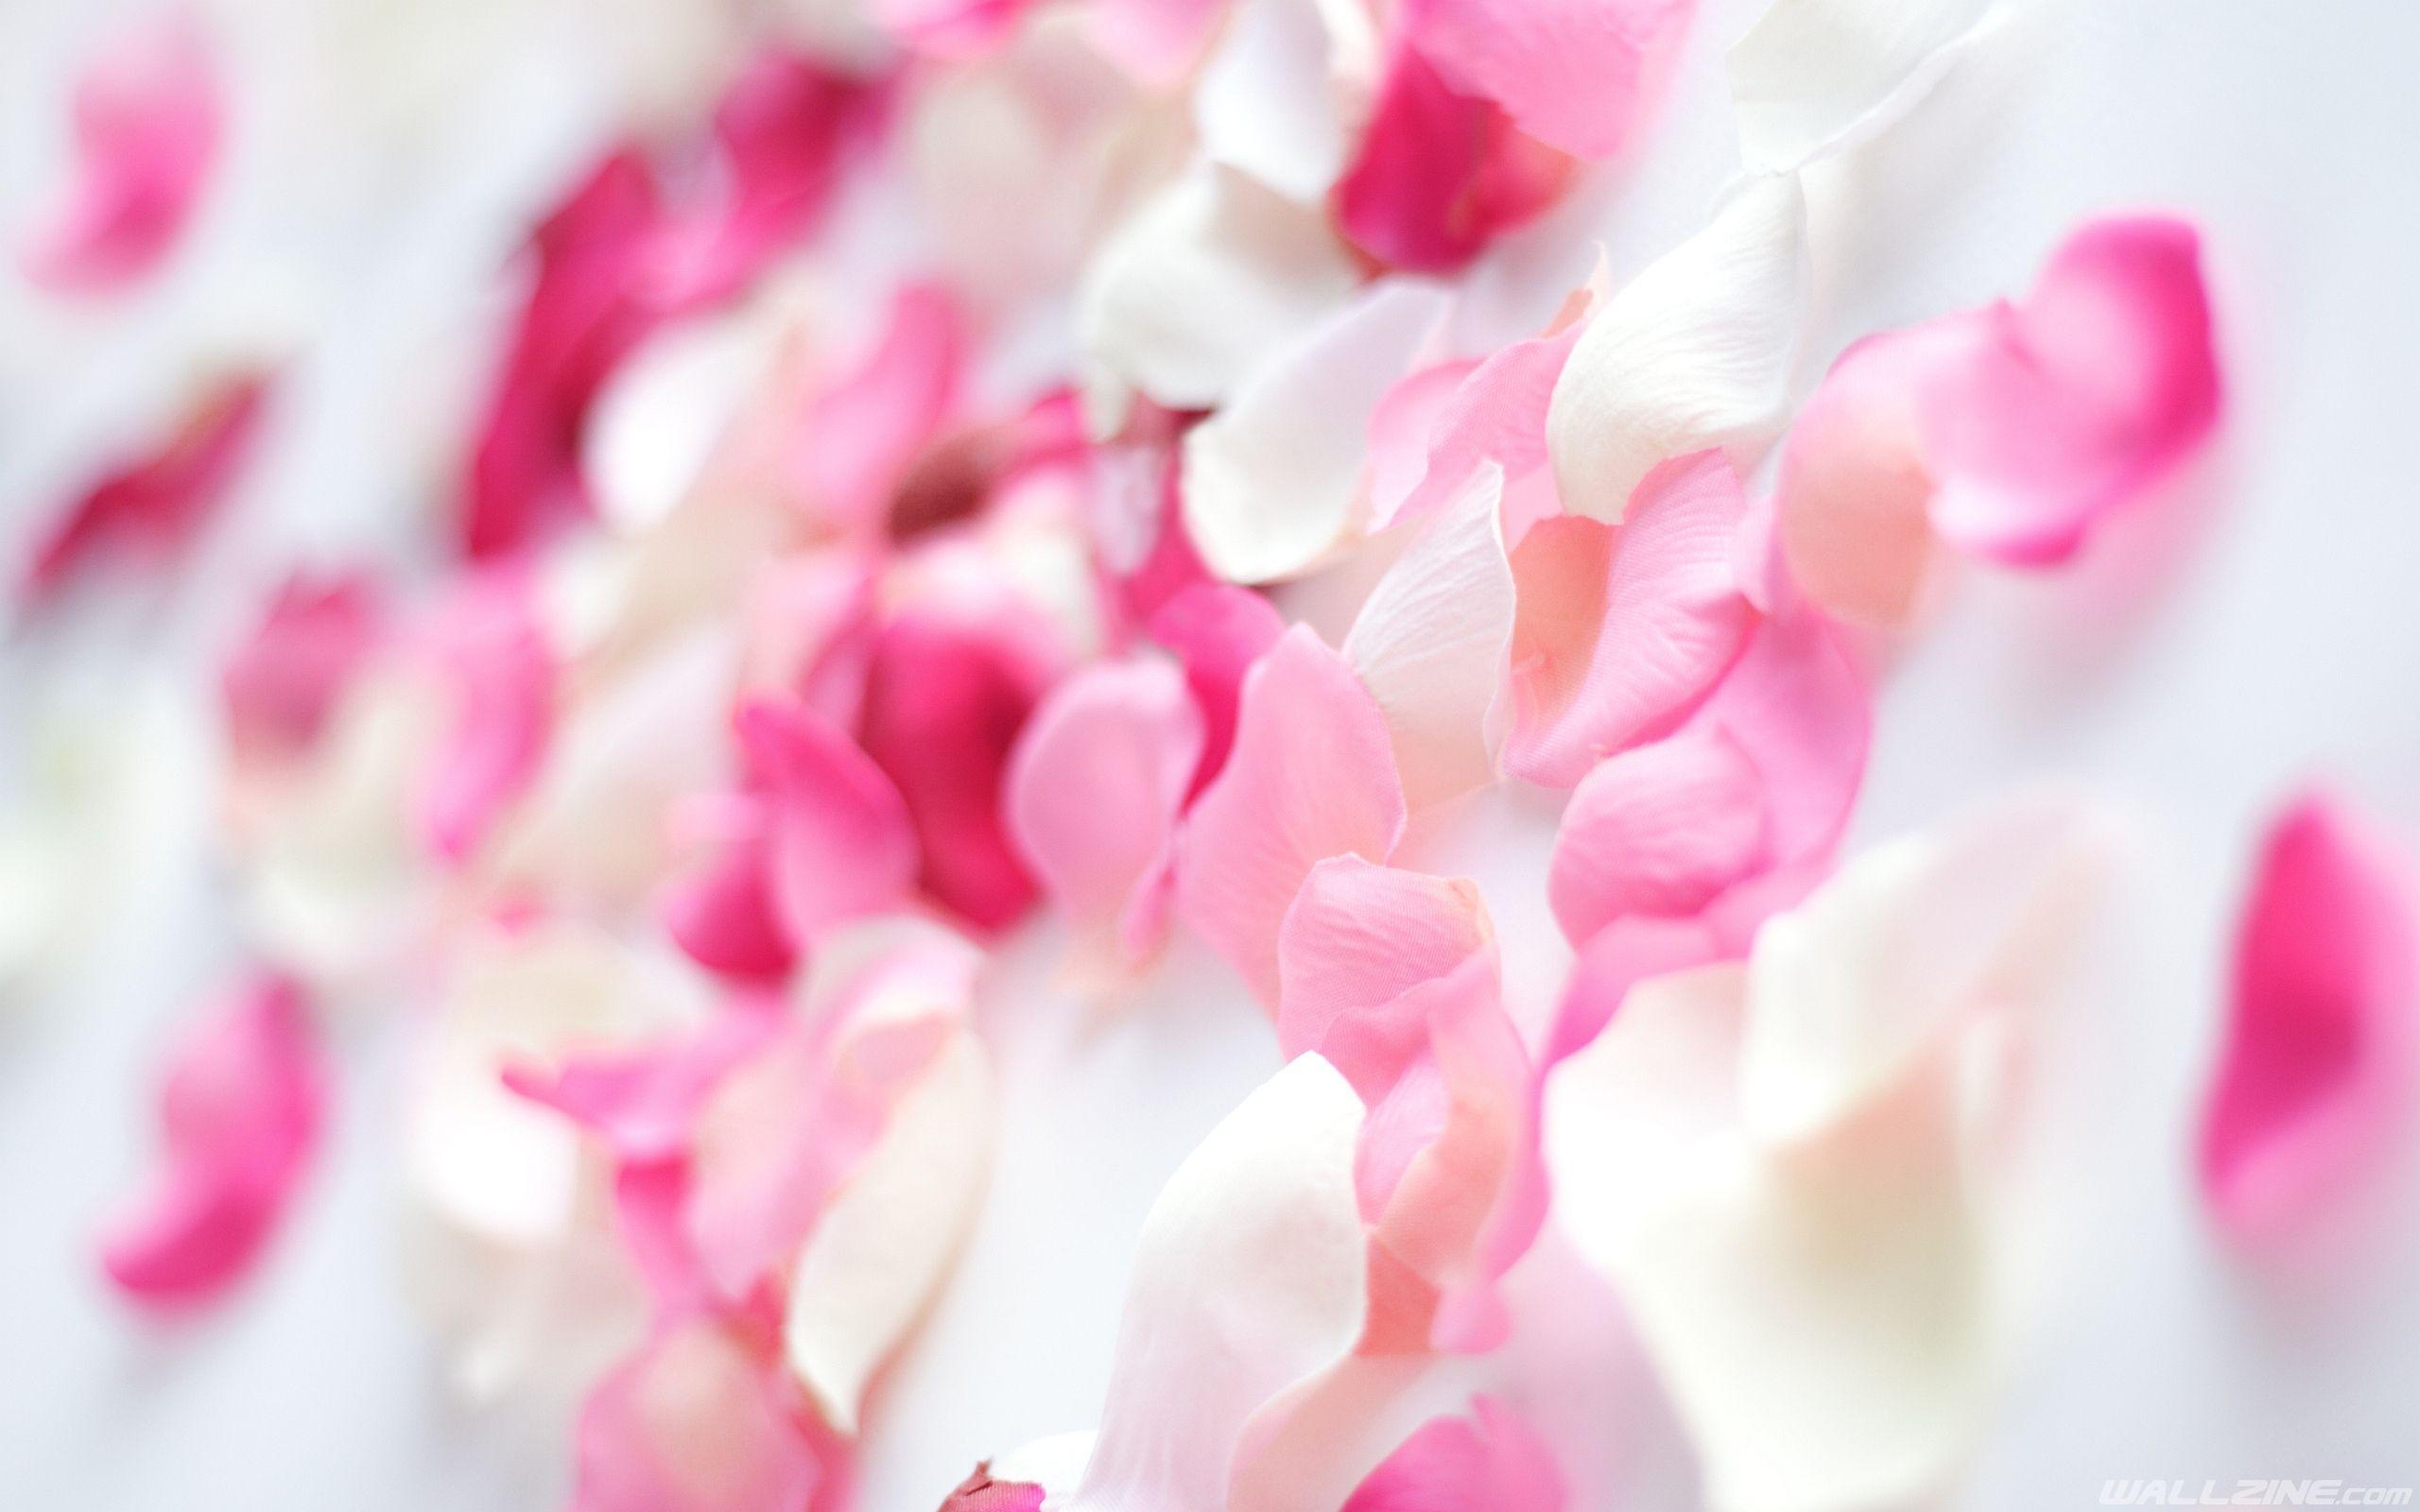 Flower Petal Images Hd Desktop Wallpaper Wallzine Com Pink Flowers Wallpaper Orchid Flower Wallpaper Flower Wallpaper Hd Flower petals wallpaper hd